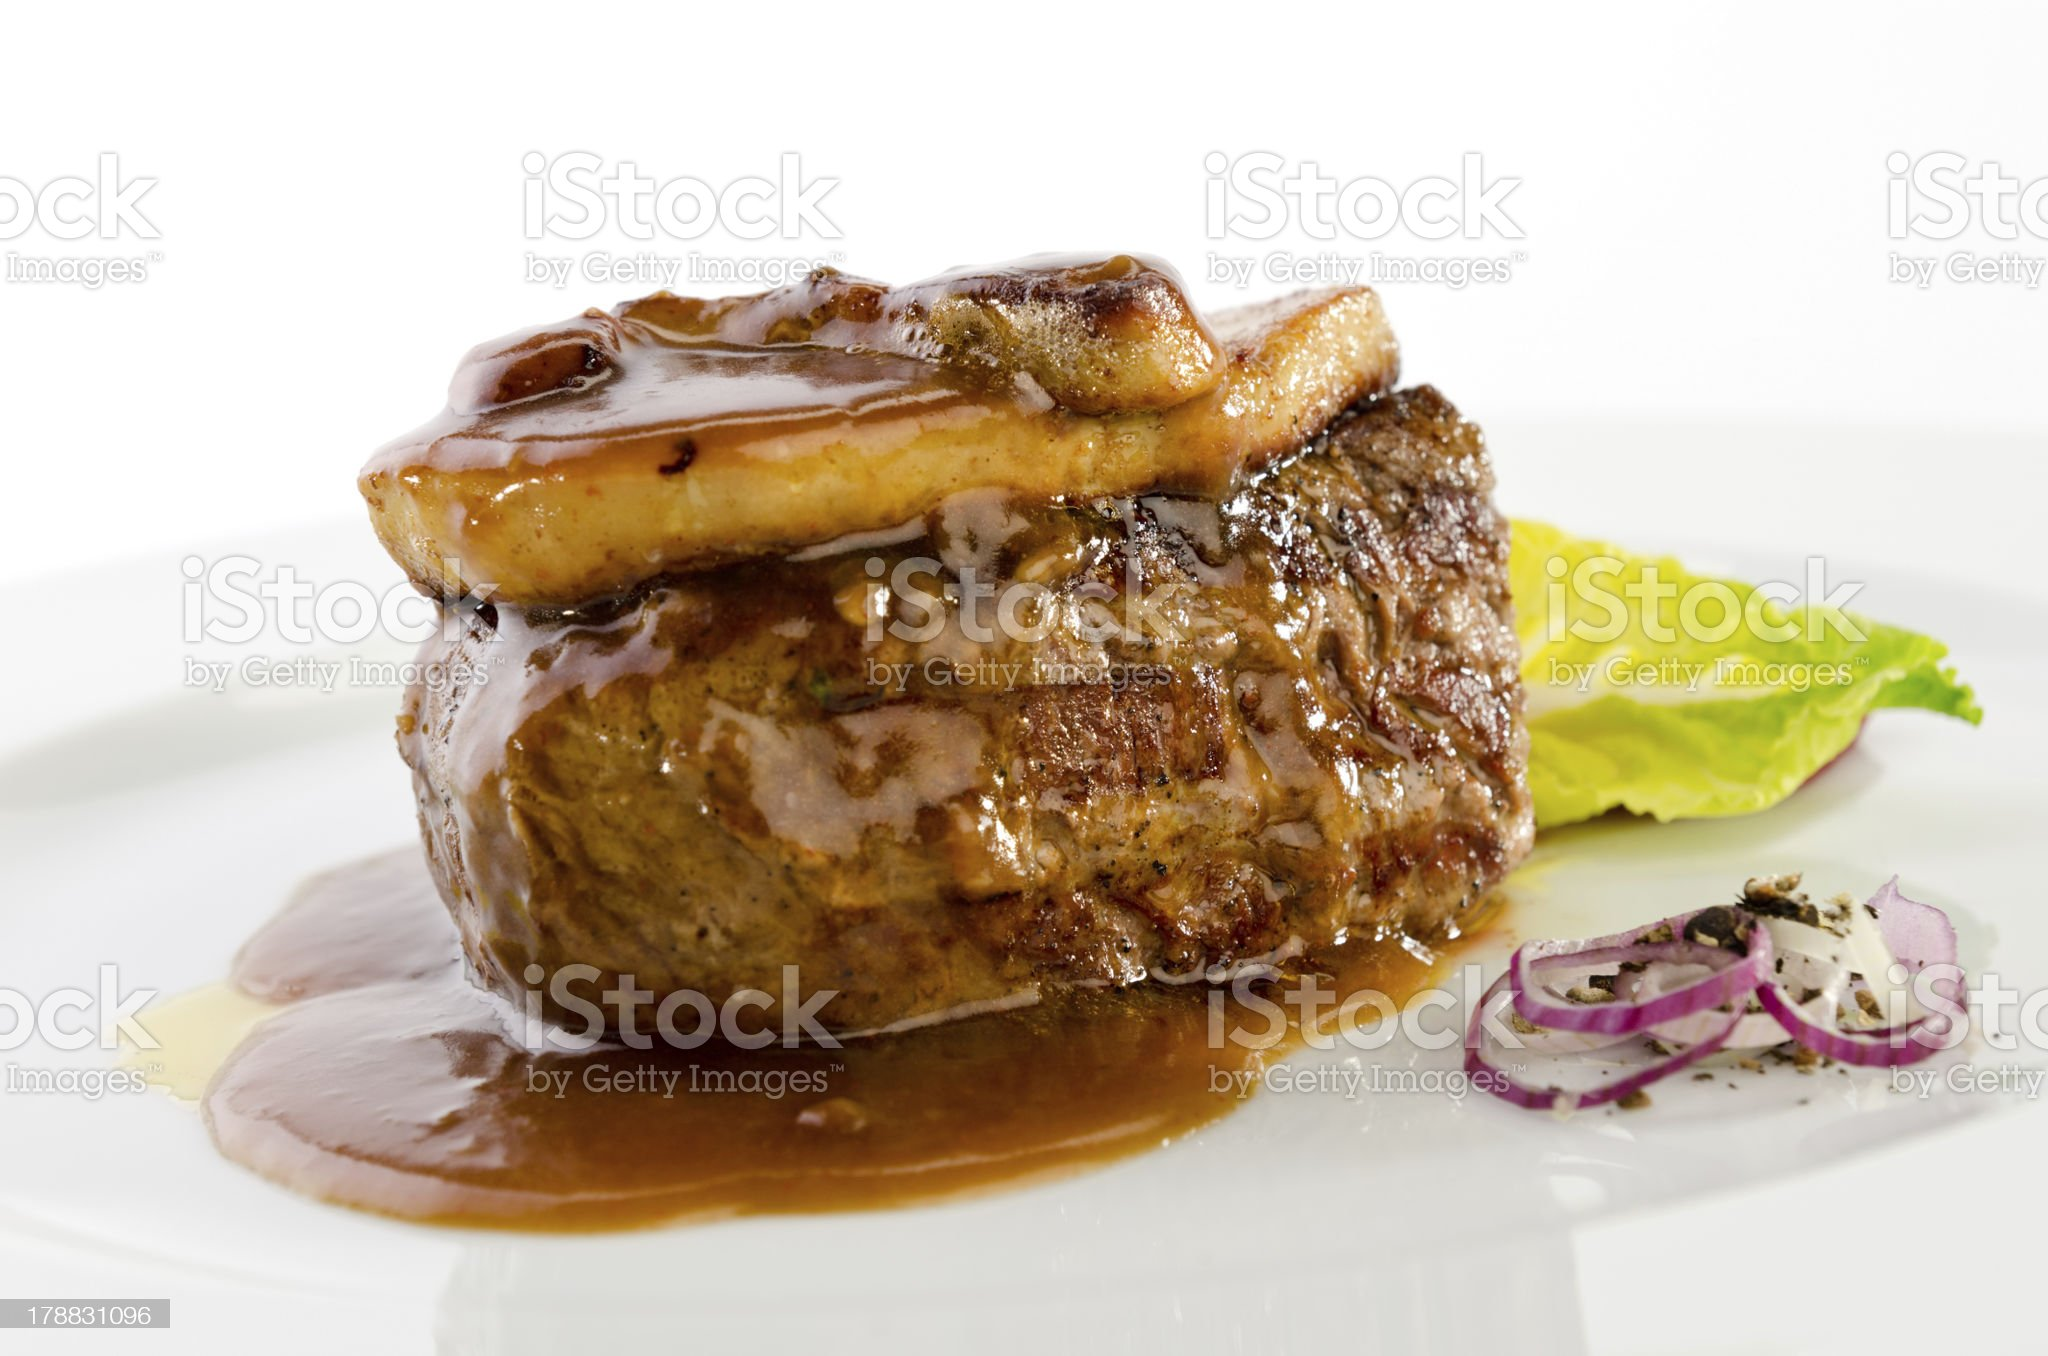 Beef foie gras royalty-free stock photo